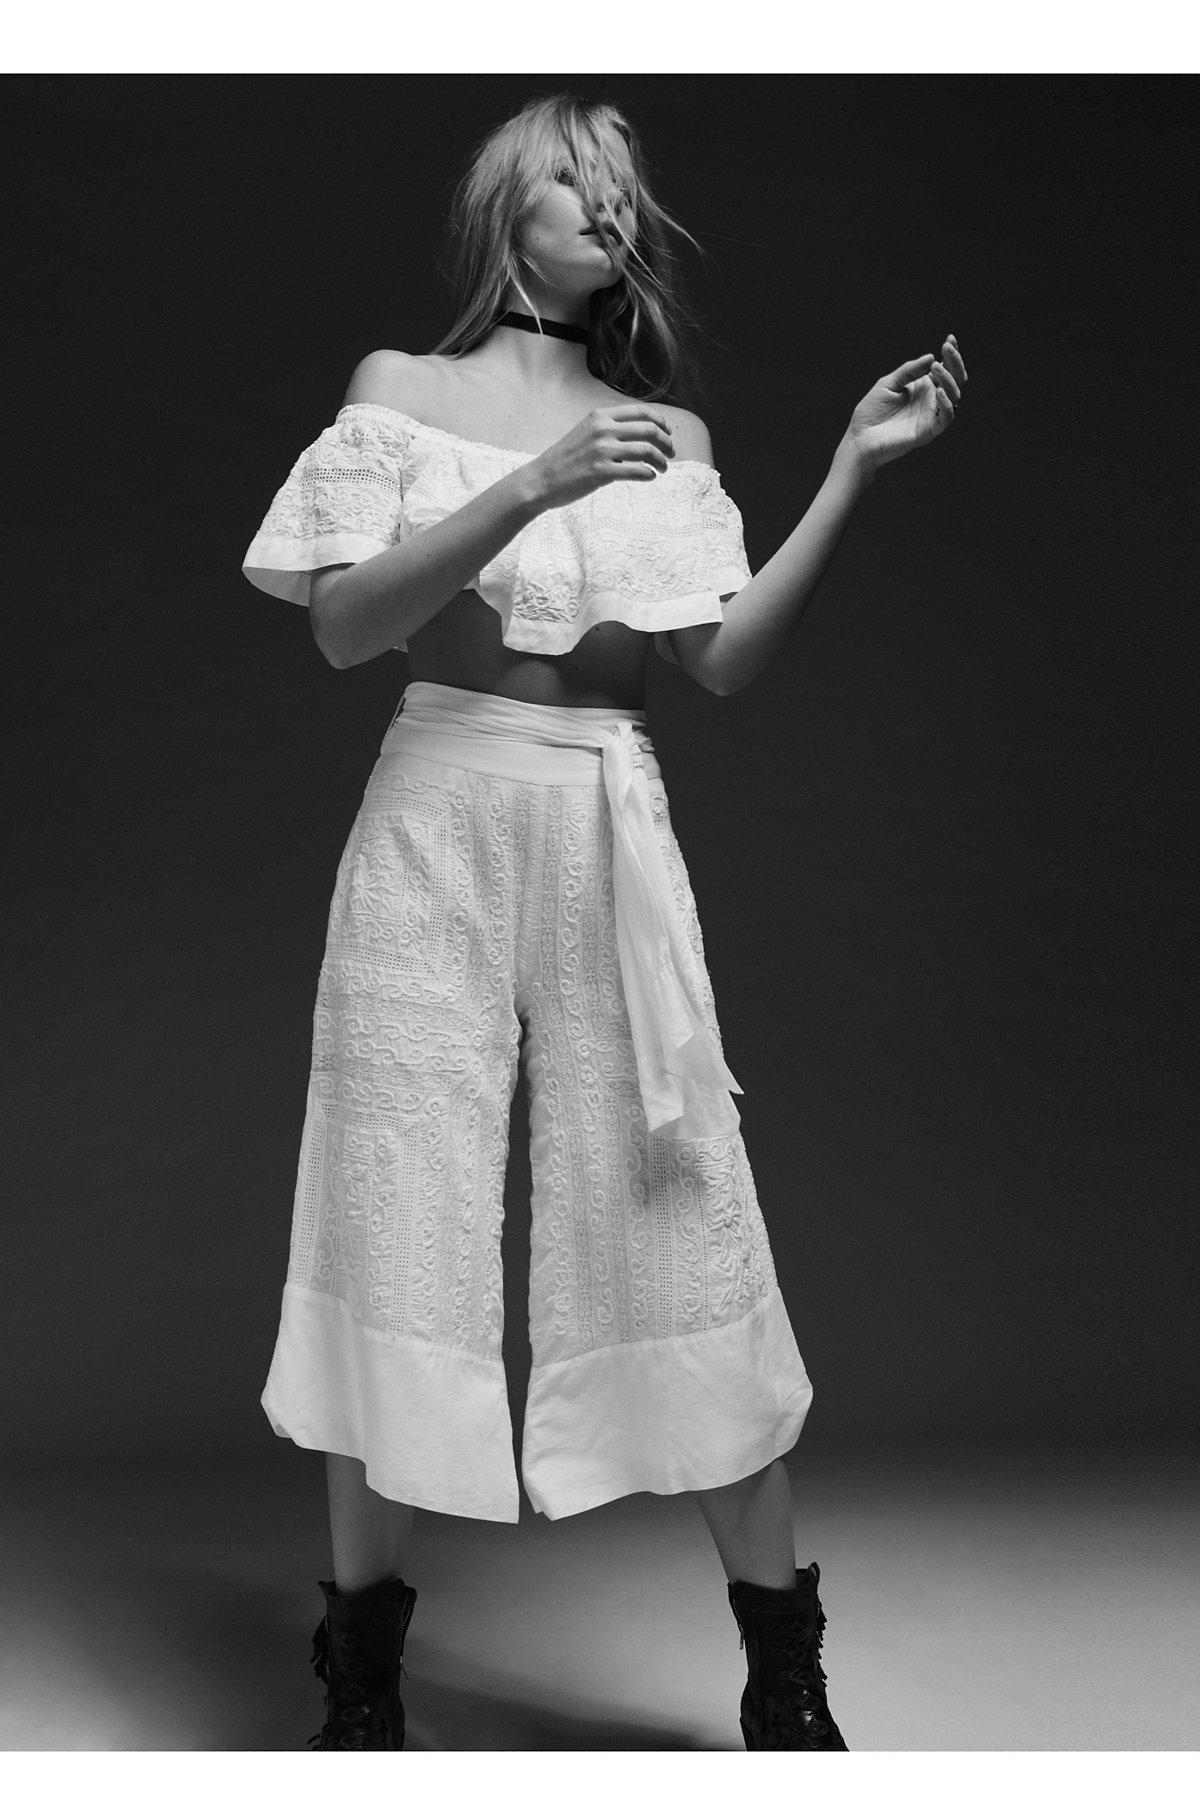 Limited Edition Gemma White Set